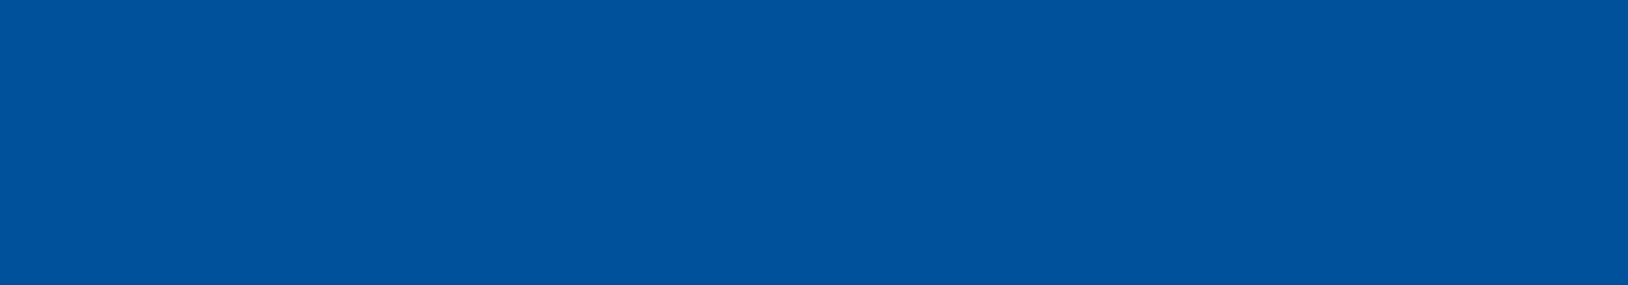 Signavio Dr. Güldener Firmengruppe Customer Logo